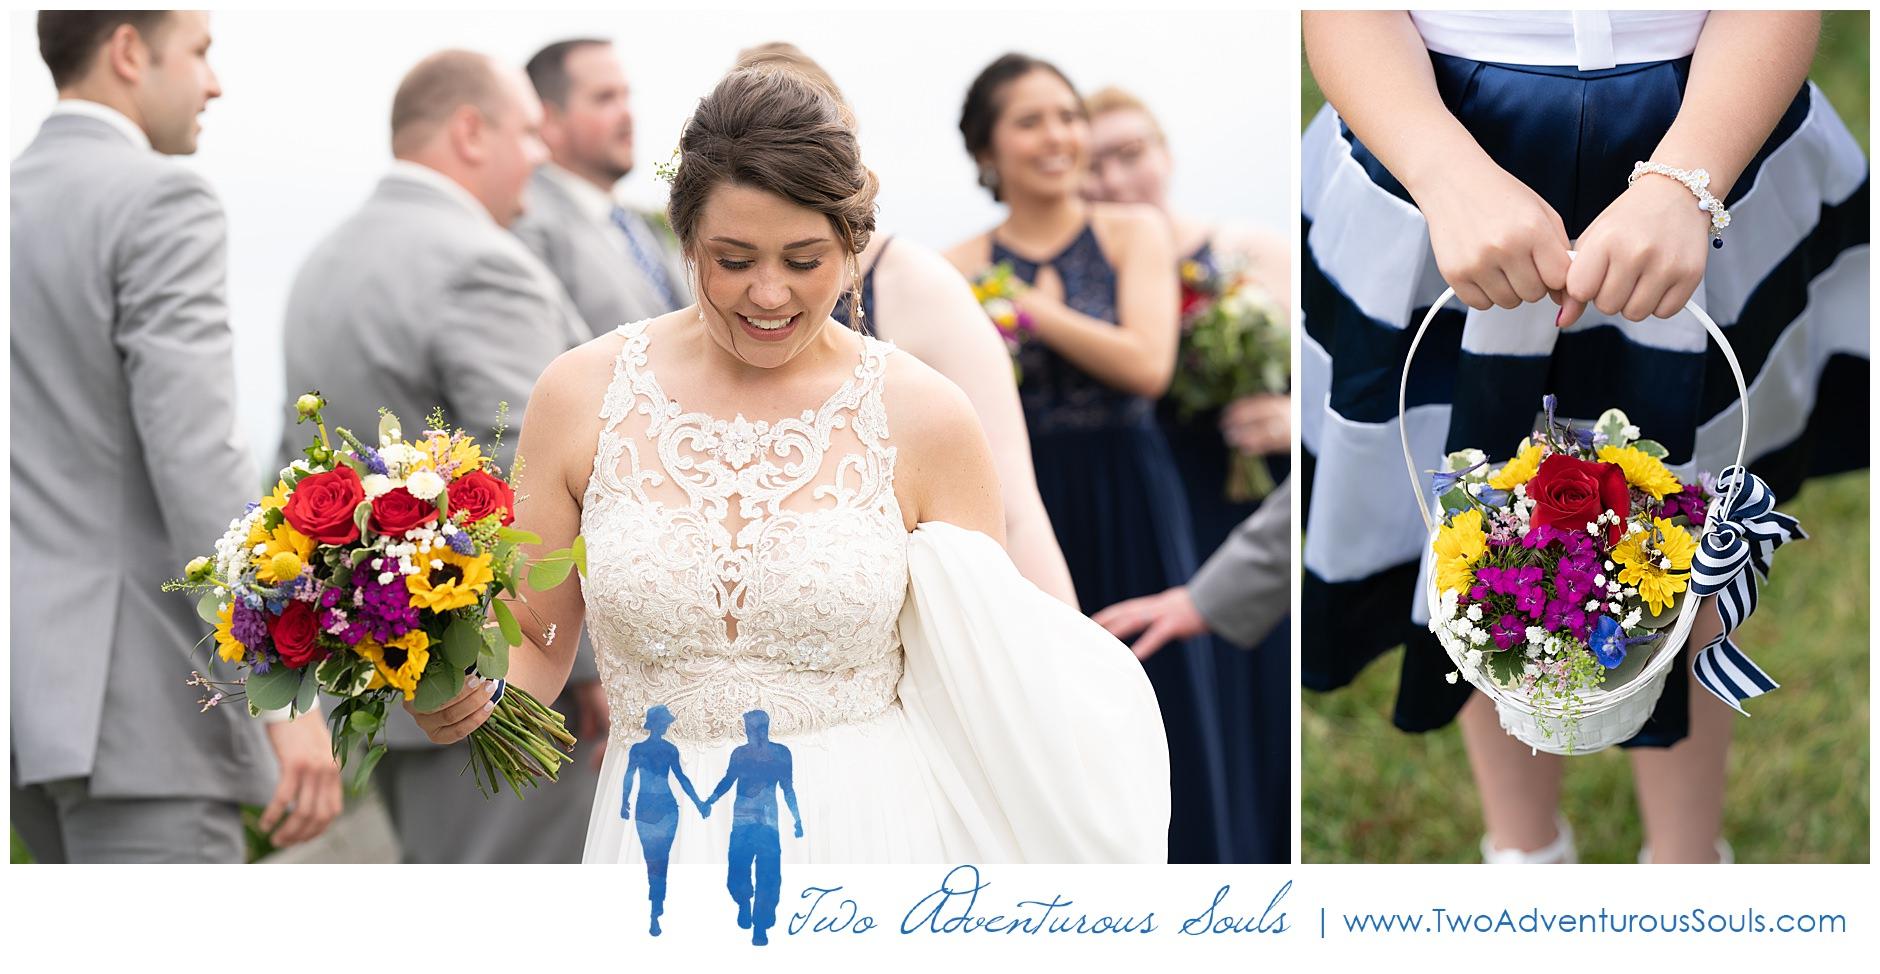 Maine Wedding Photographers, SMCC Wedding Photographers, Southern Maine Community College Wedding Photographers, Two Adventurous Souls-AshleyAaron_0031.jpg